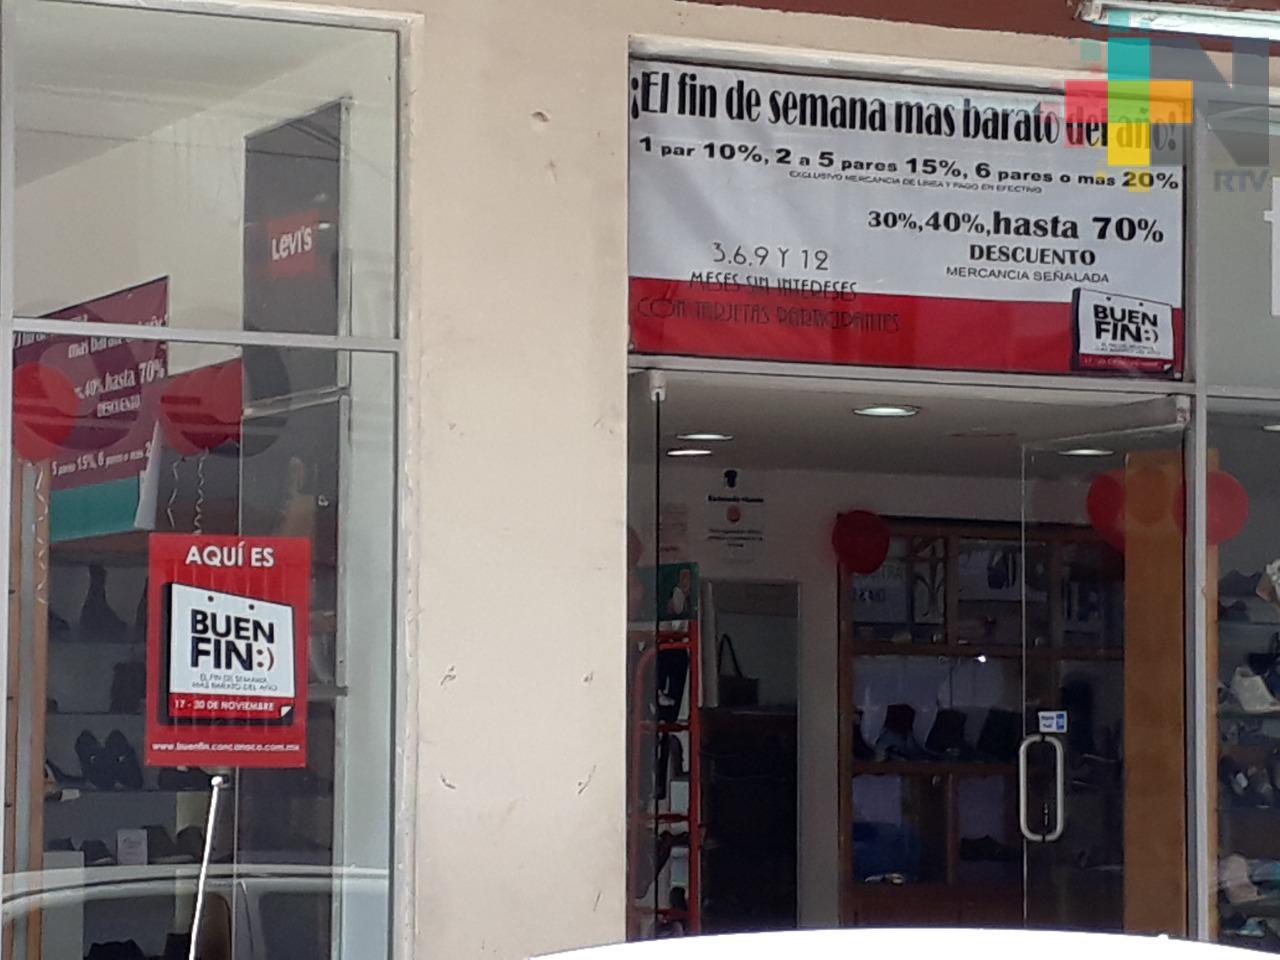 Cerca de 400 empresas tuxpeñas se espera participen en el Buen Fin: Canaco